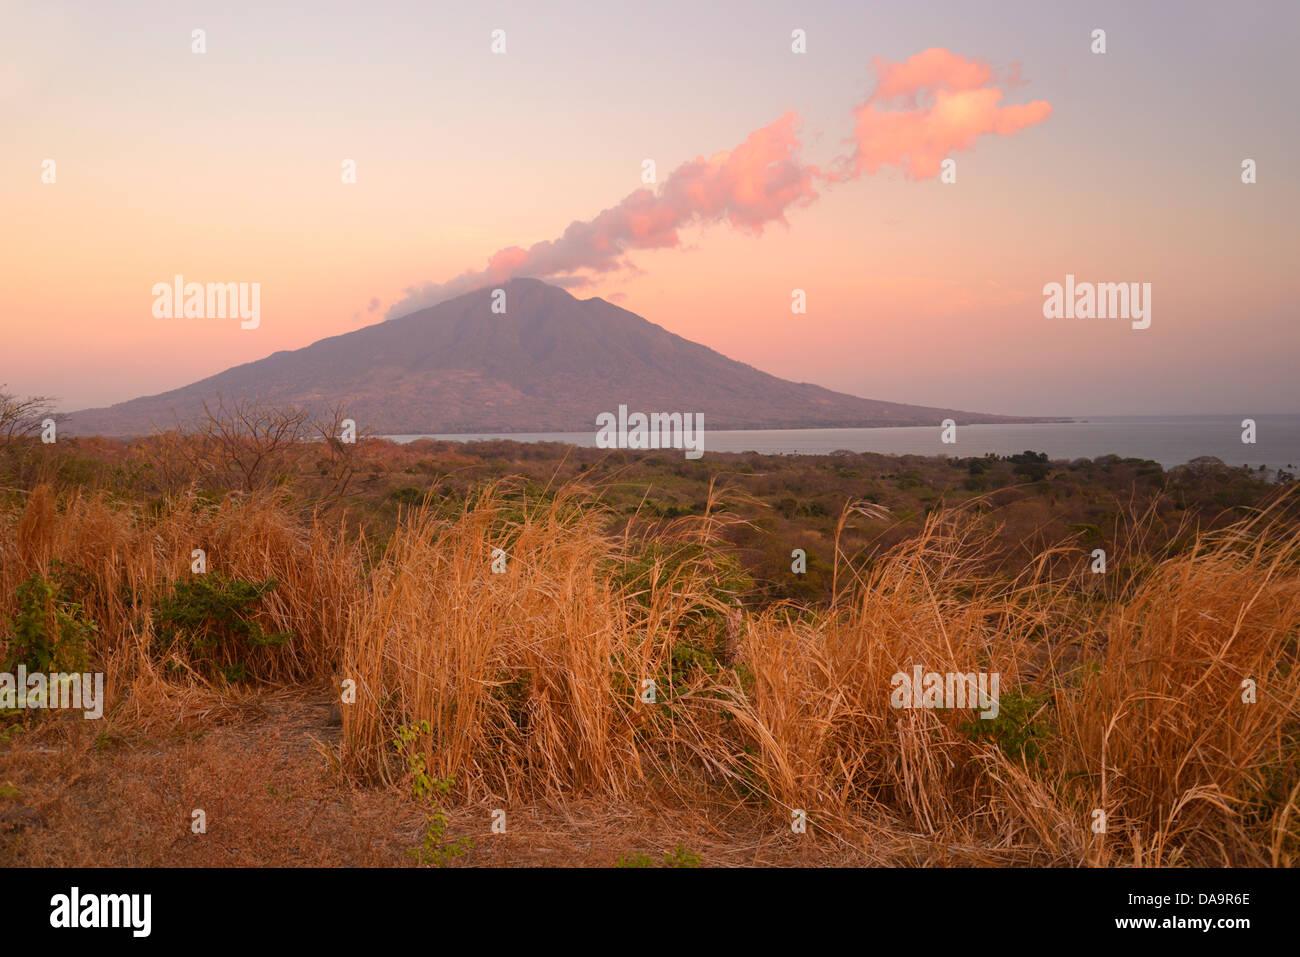 Central America, Nicaragua, Rivas, Isla Ometepe, UNESCO, Biosphere, Preserve, island, volcano, peak, maderas, Moyogalpa Stock Photo